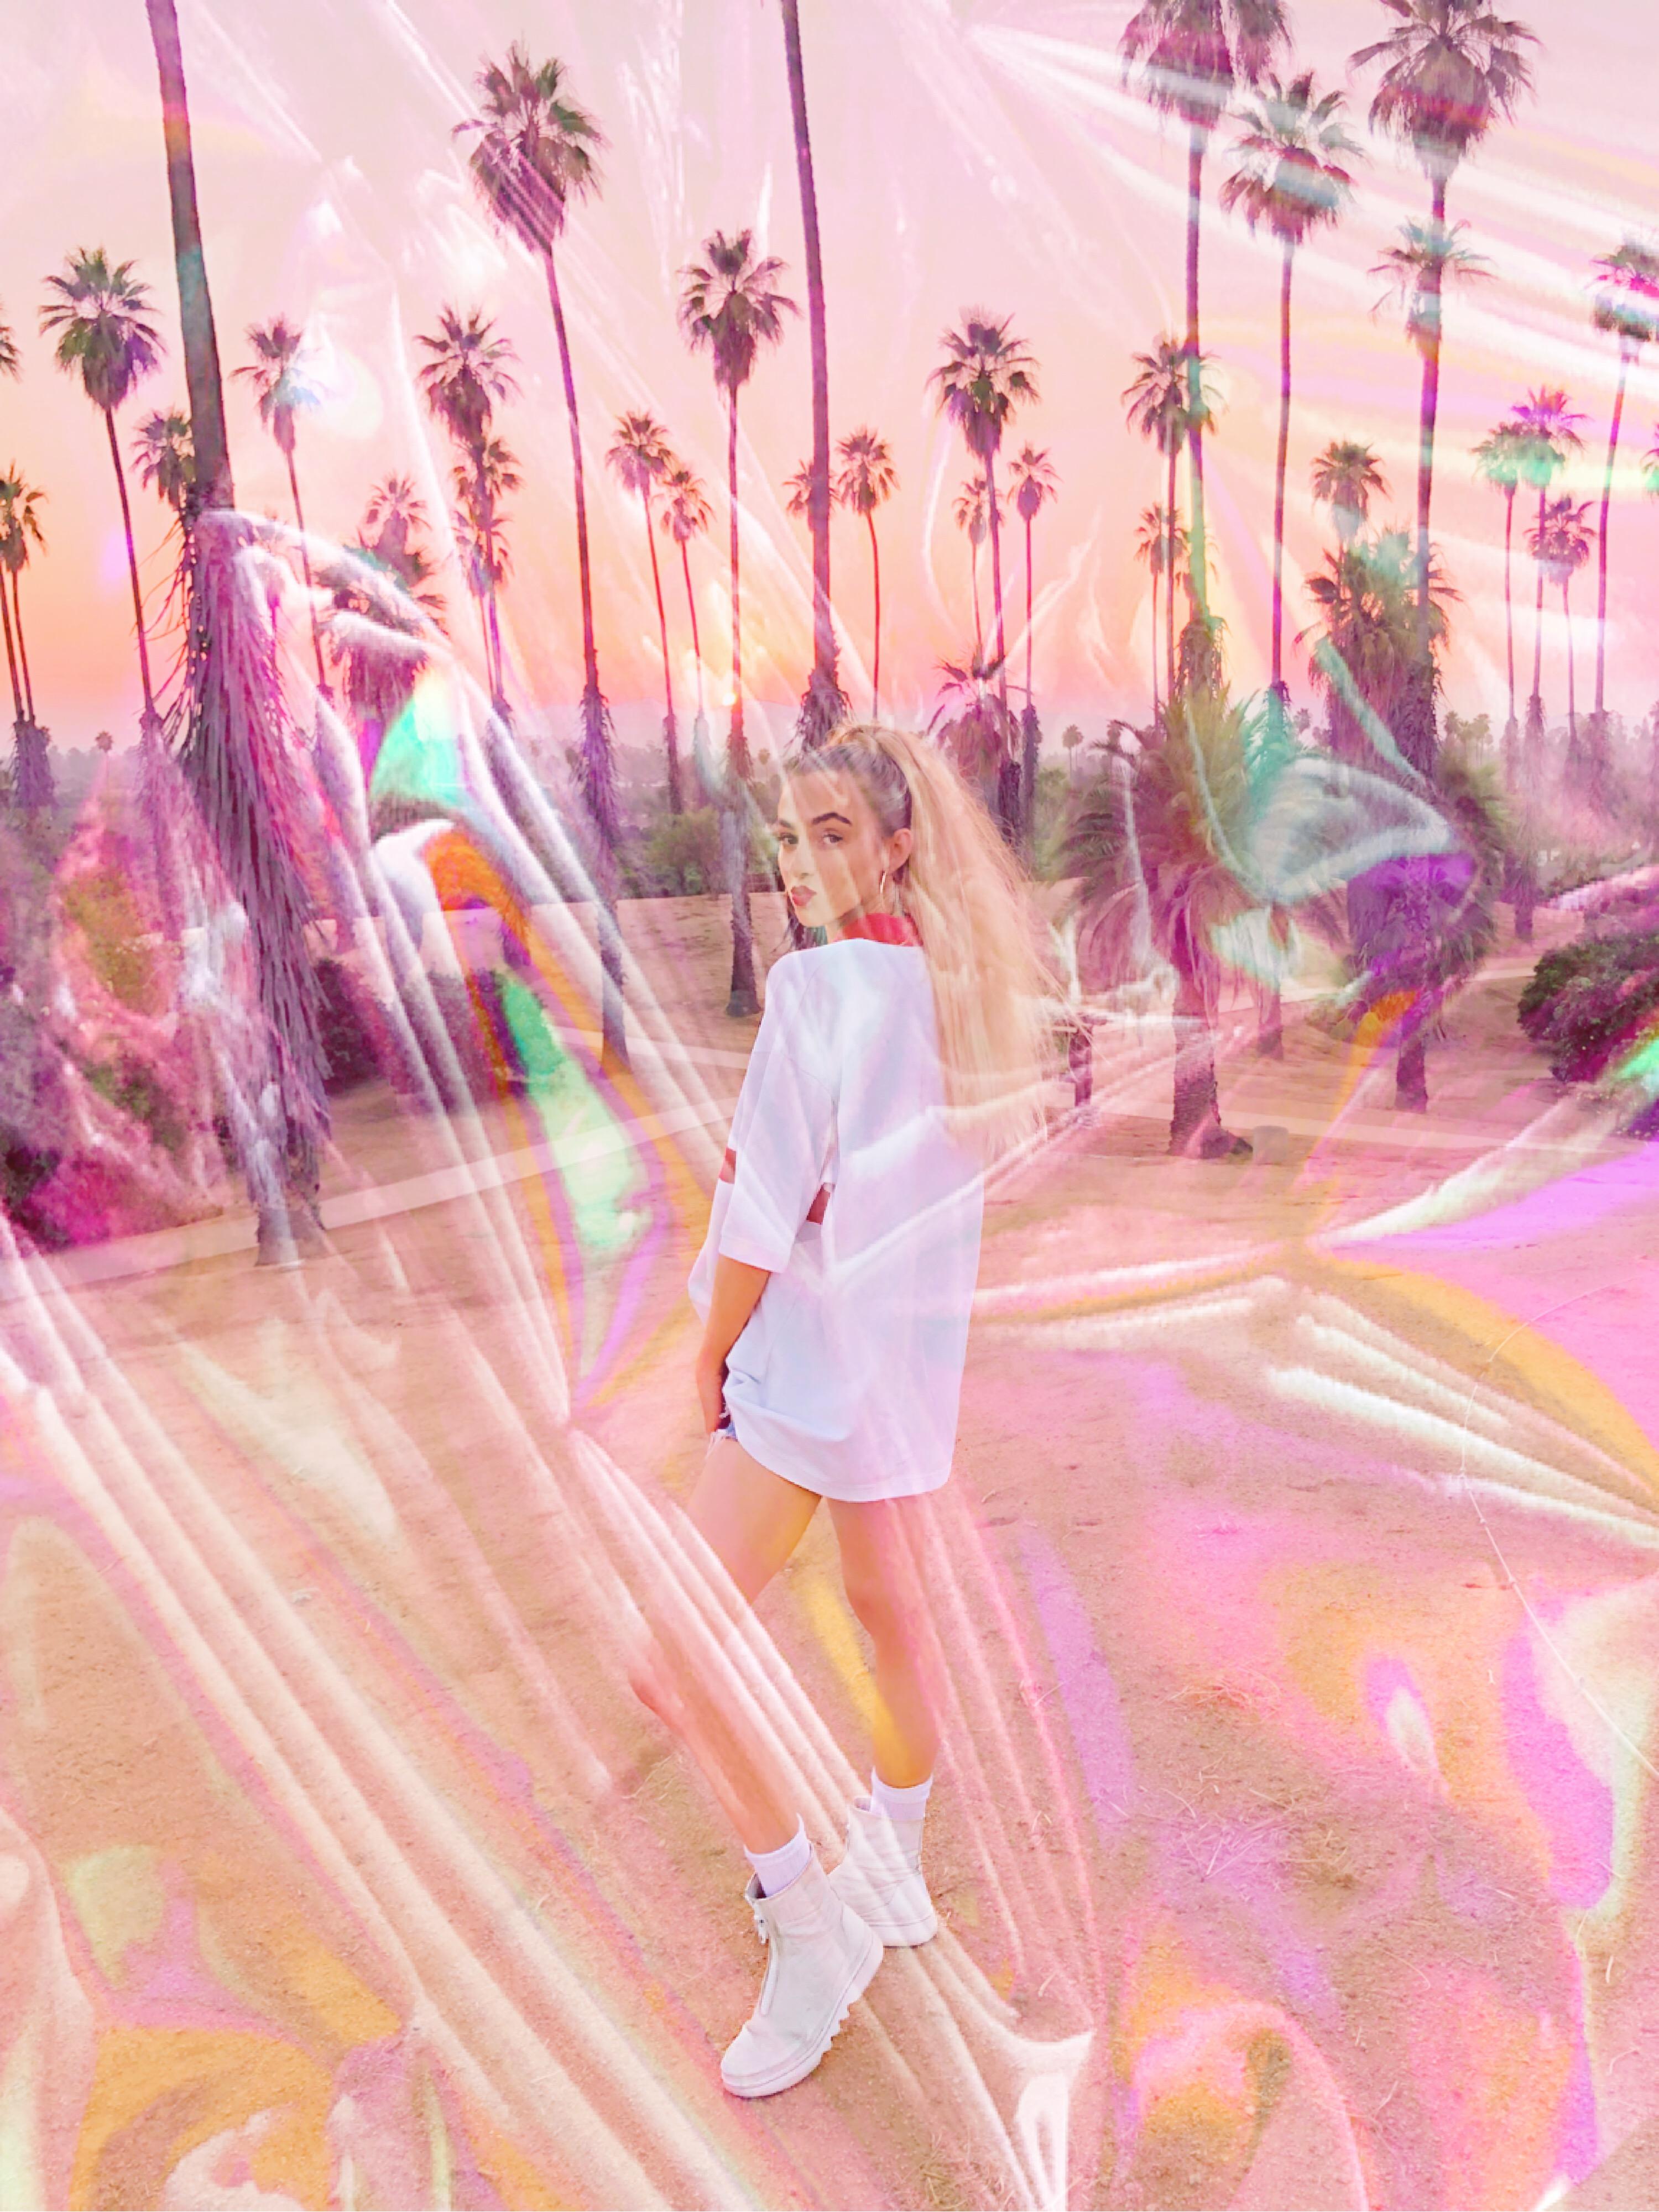 Plastic wrap edit #plastic #mask #wrap #cool #california #model #trendy #lit